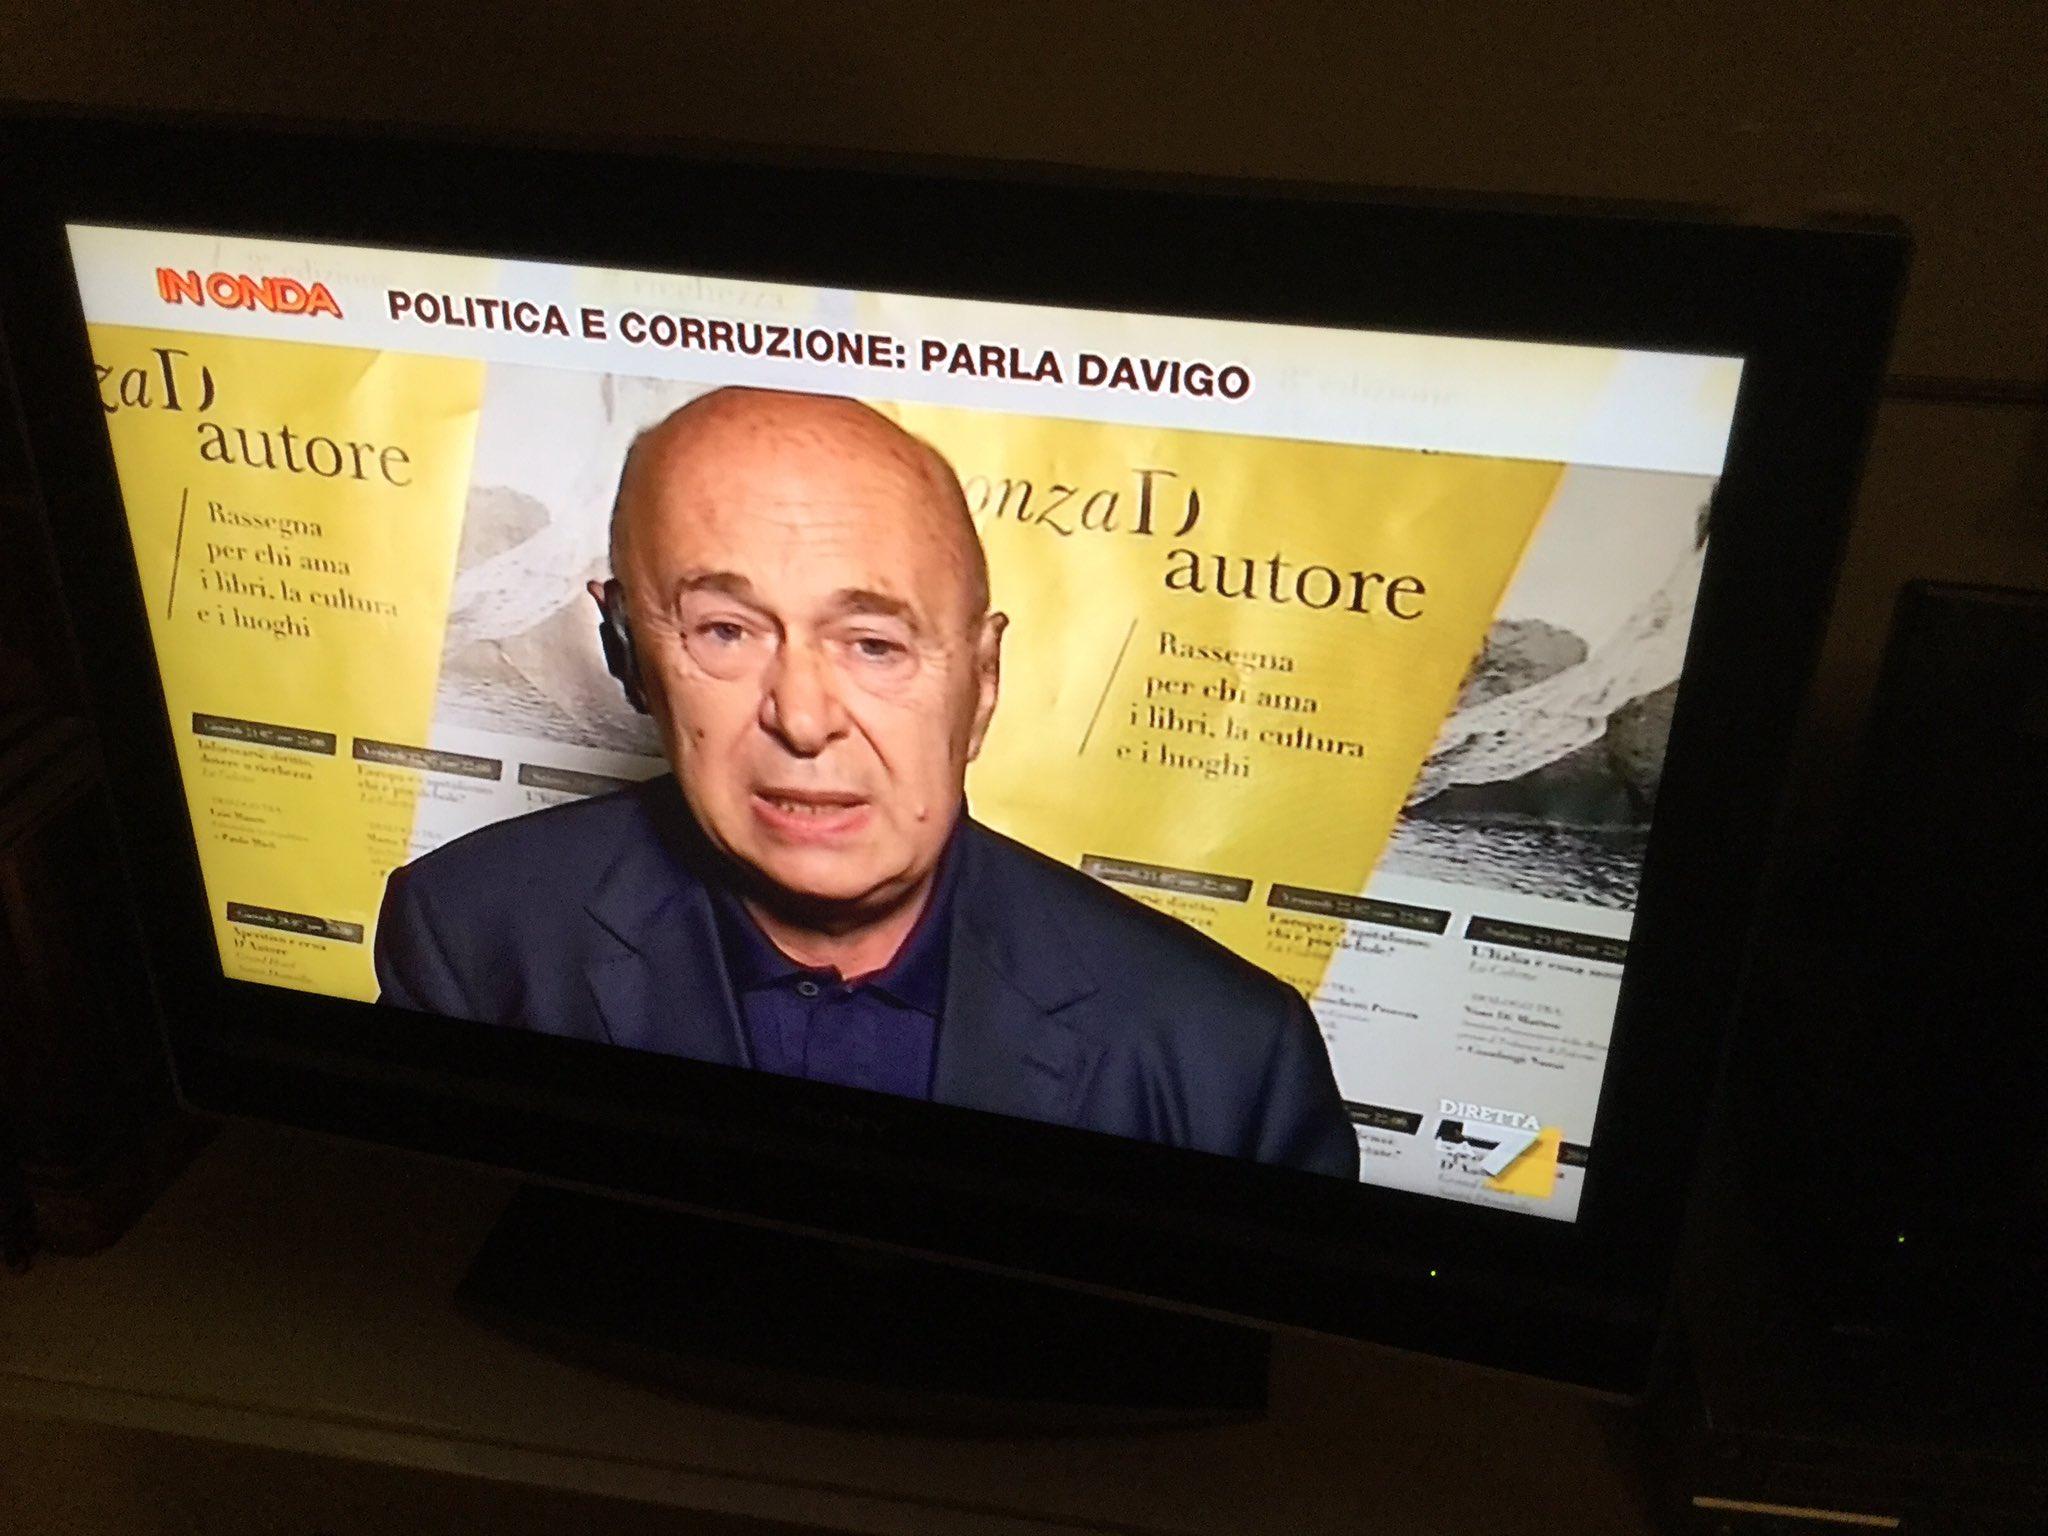 bel colpo di Visverbi su La 7 per @PonzadAutore,brave https://t.co/ykY2F2vHNM https://t.co/T8HyK4pHsd